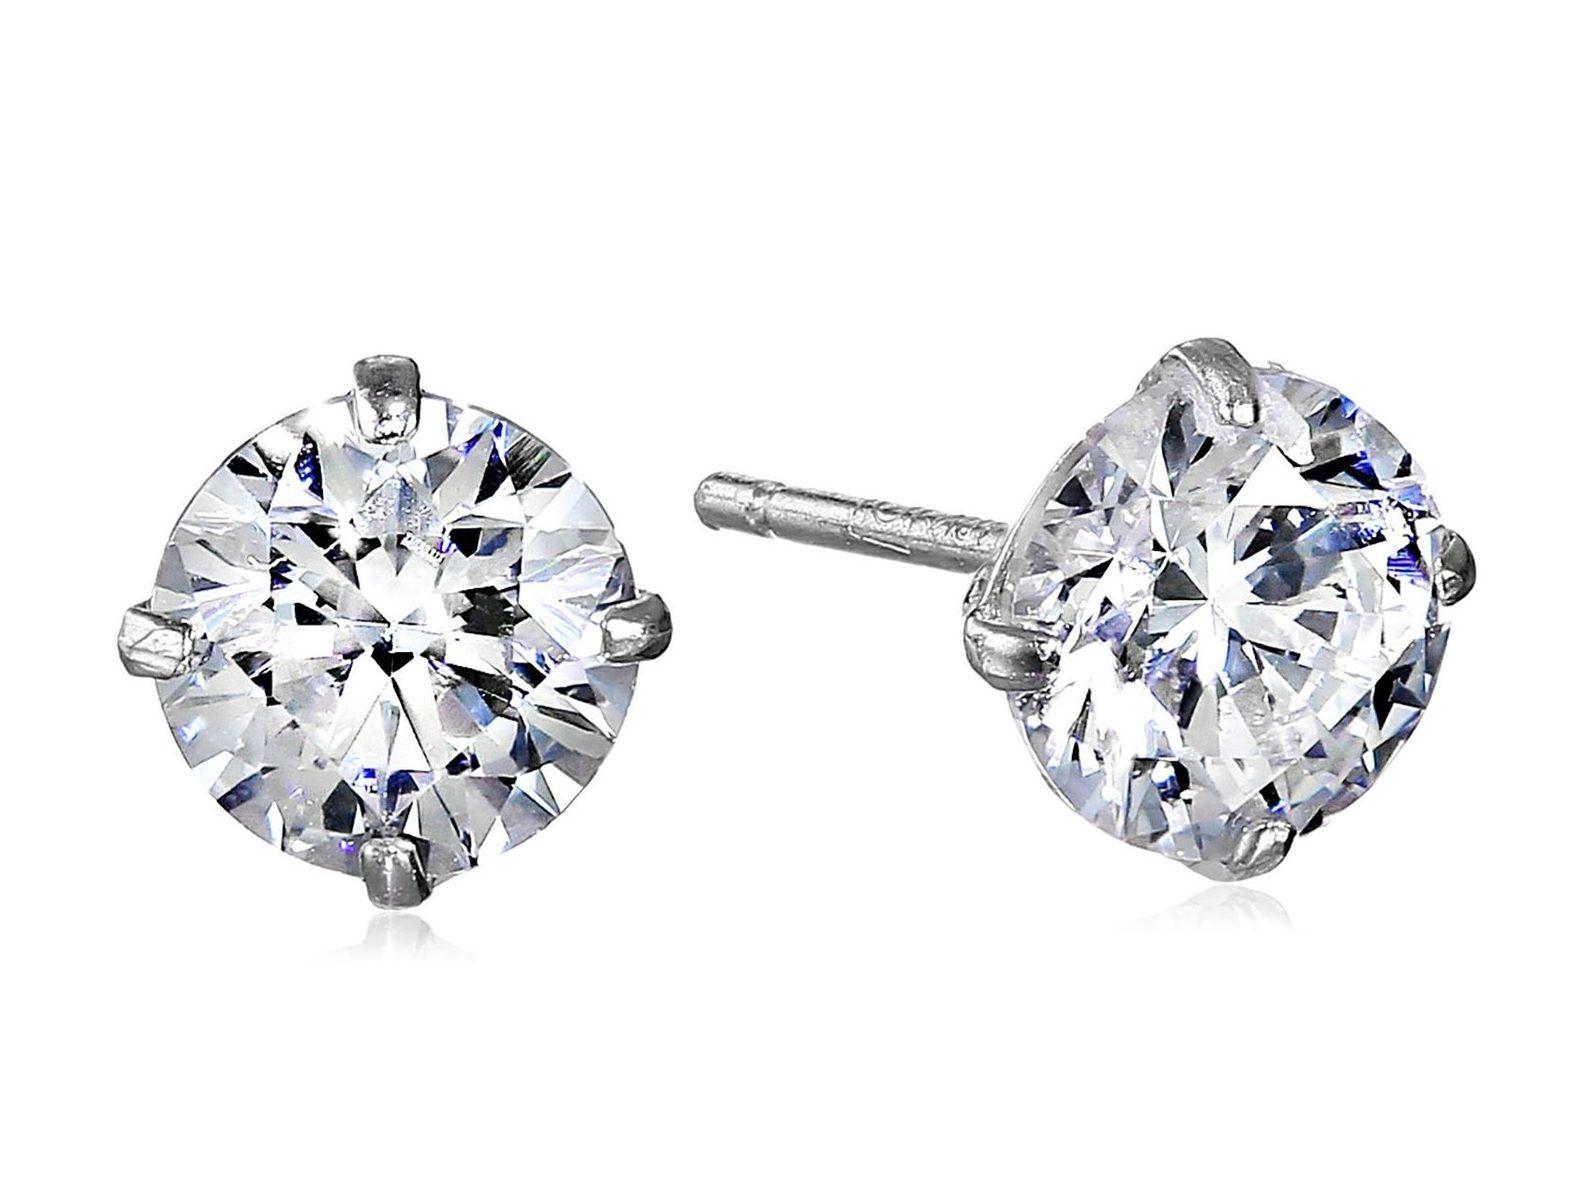 10k Gold Swarovski Zirconia Stud Earrings  Earrings  JewelryEarrings. Belos  BrincosBrincos De TachaSwarovskiOuro Branco 9db26e3887